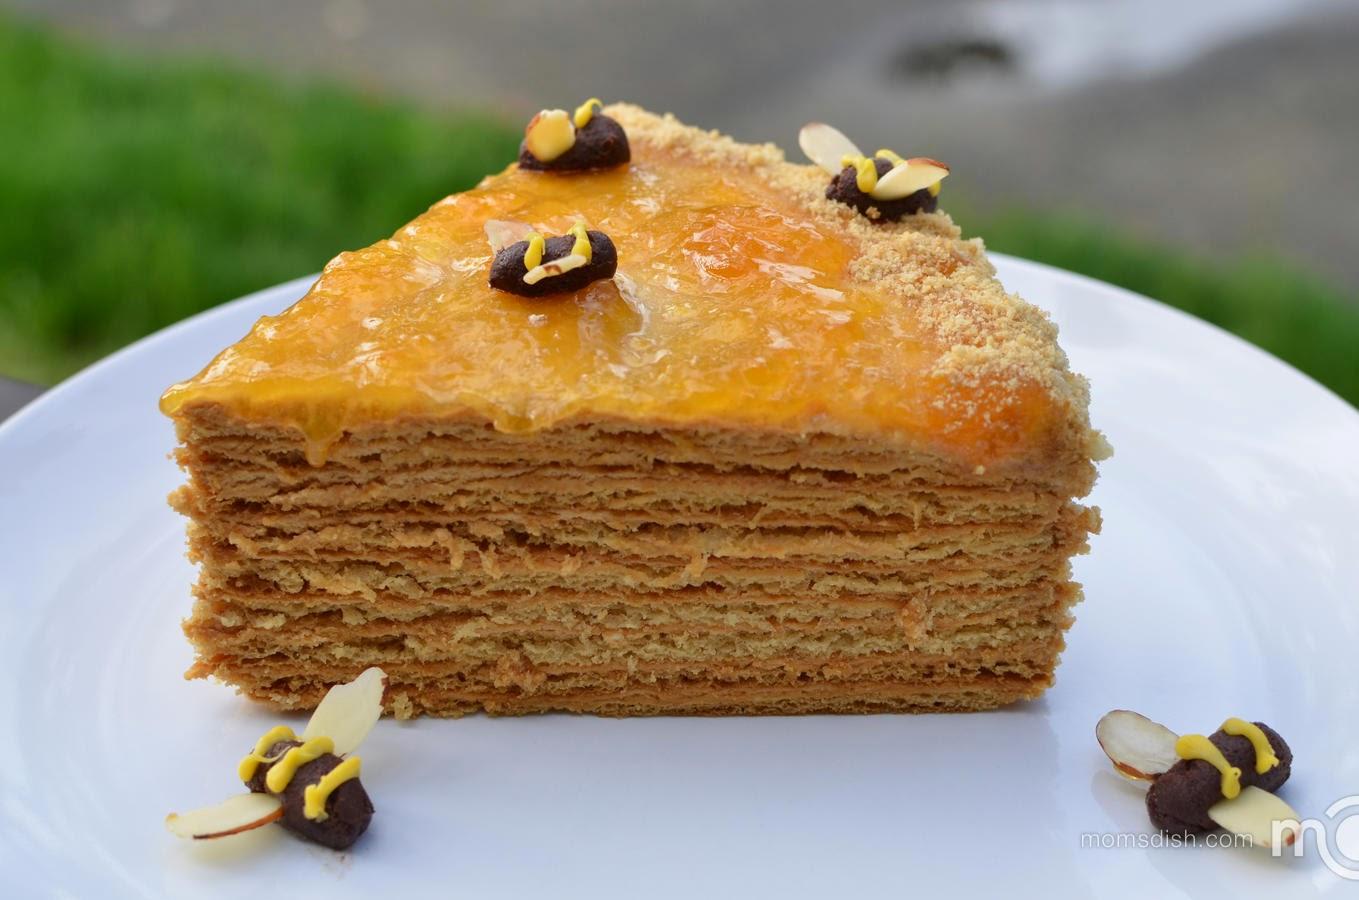 http://momsdish.com/recipe/101/russian-honey-cake